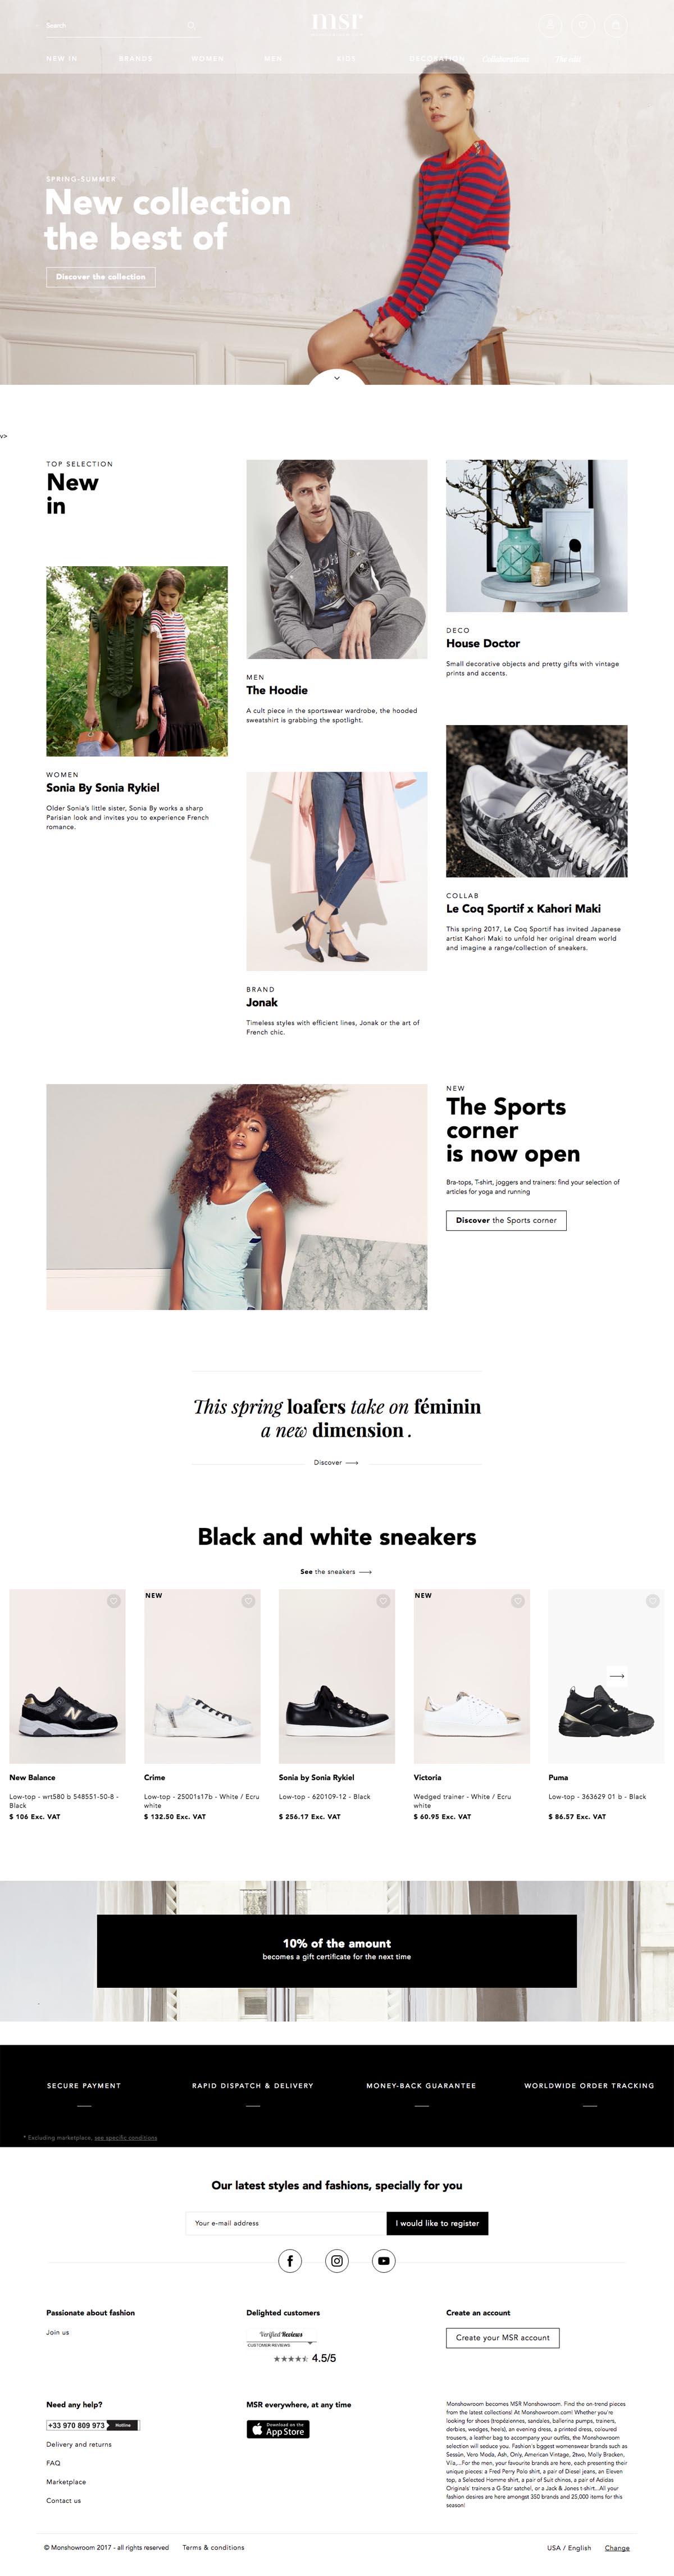 eCommerce website: Msr Monshowroom